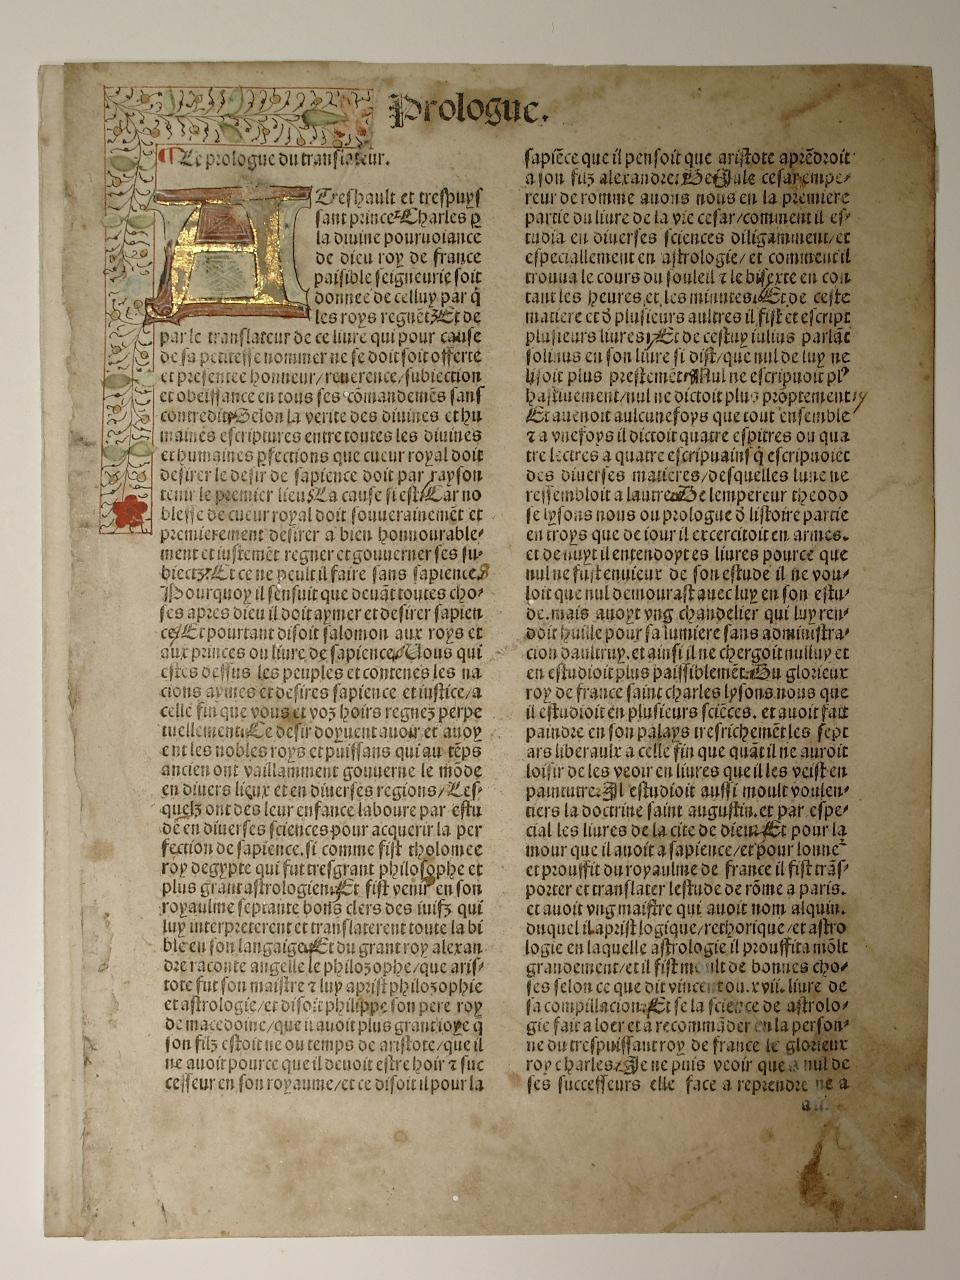 De proprietatibus rerum, franz. von Jean Corbichon.: Bartholomaeus Anglicus: